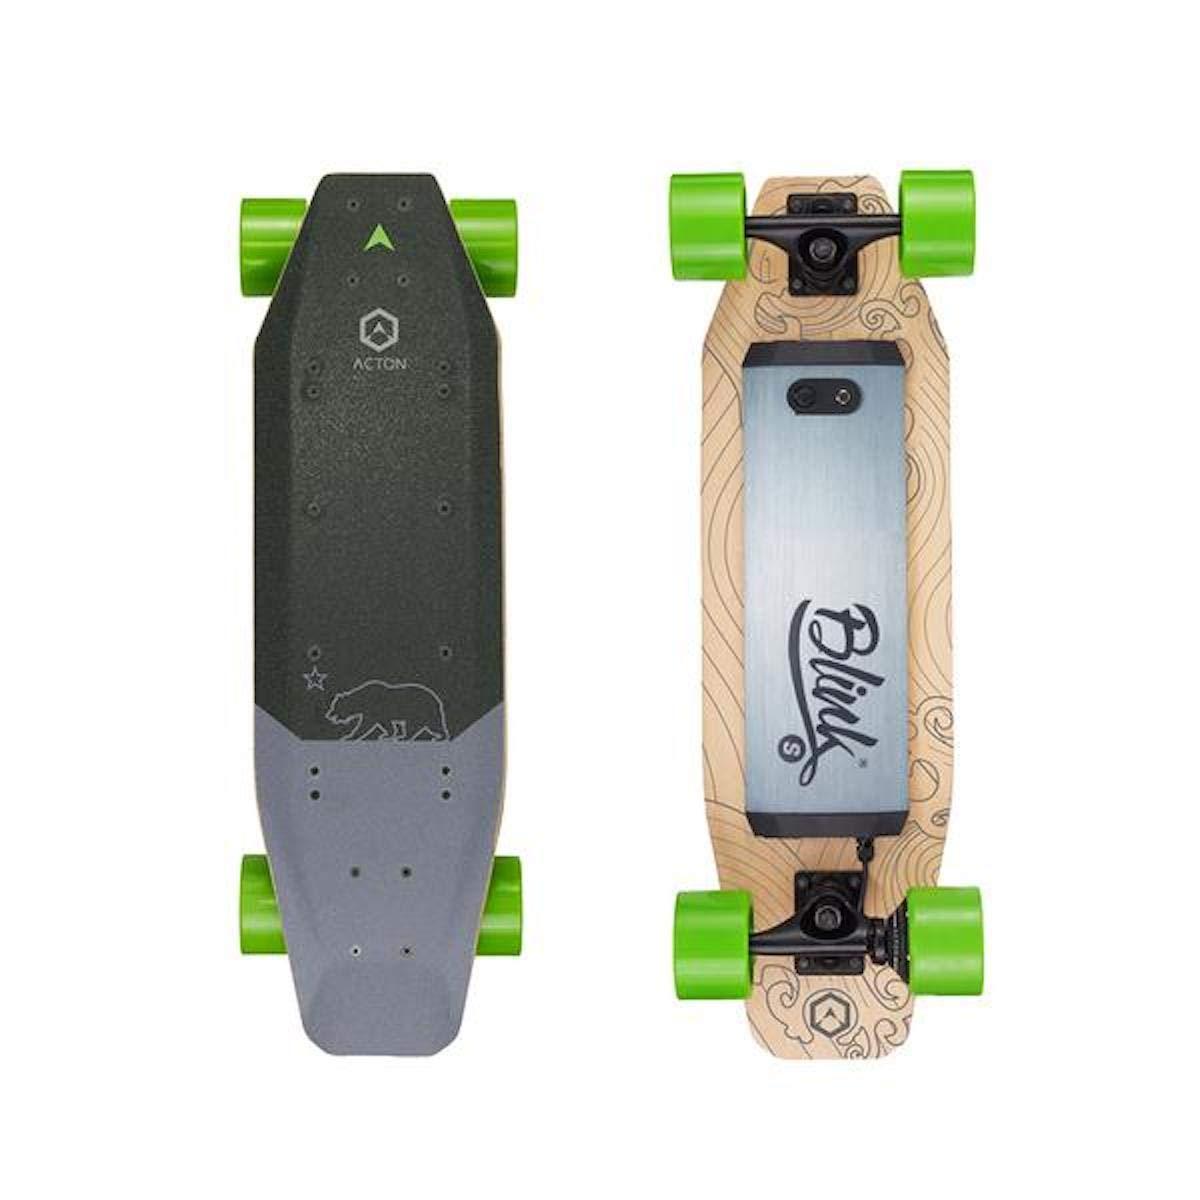 Acton Blink S2 Dual Motor Electrical Skateboard